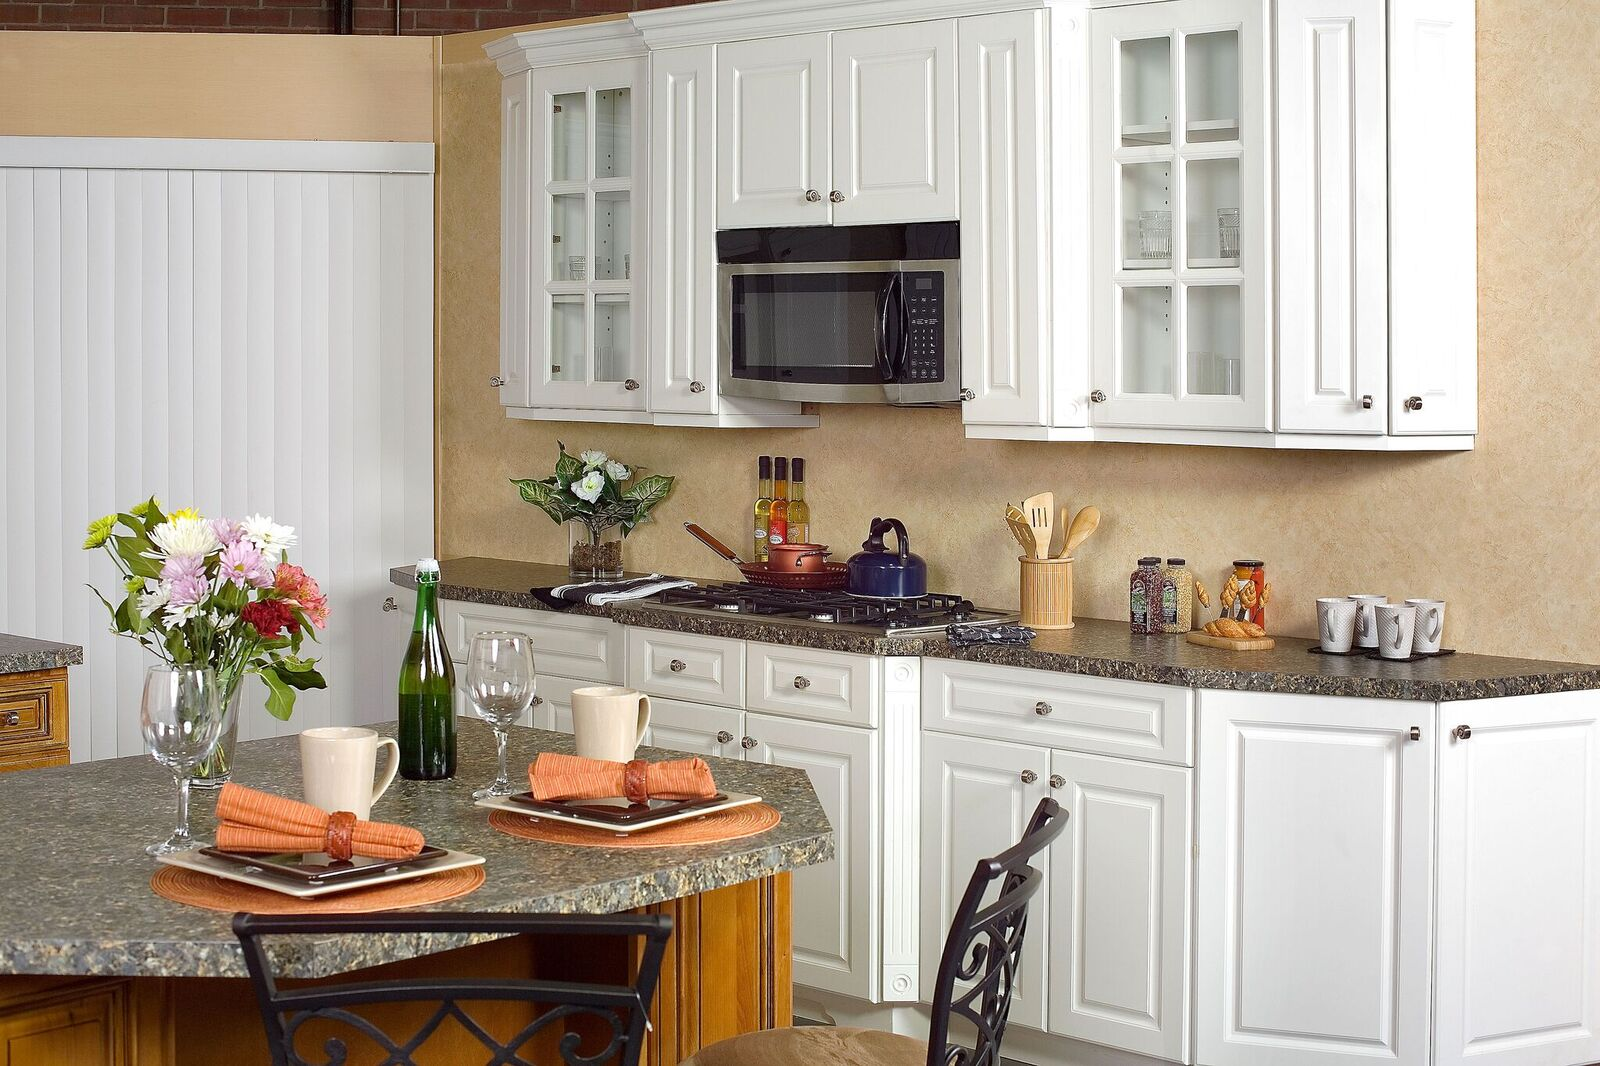 Cascade - Entrepot-cuisine-CUISINE-armoires de cuisine